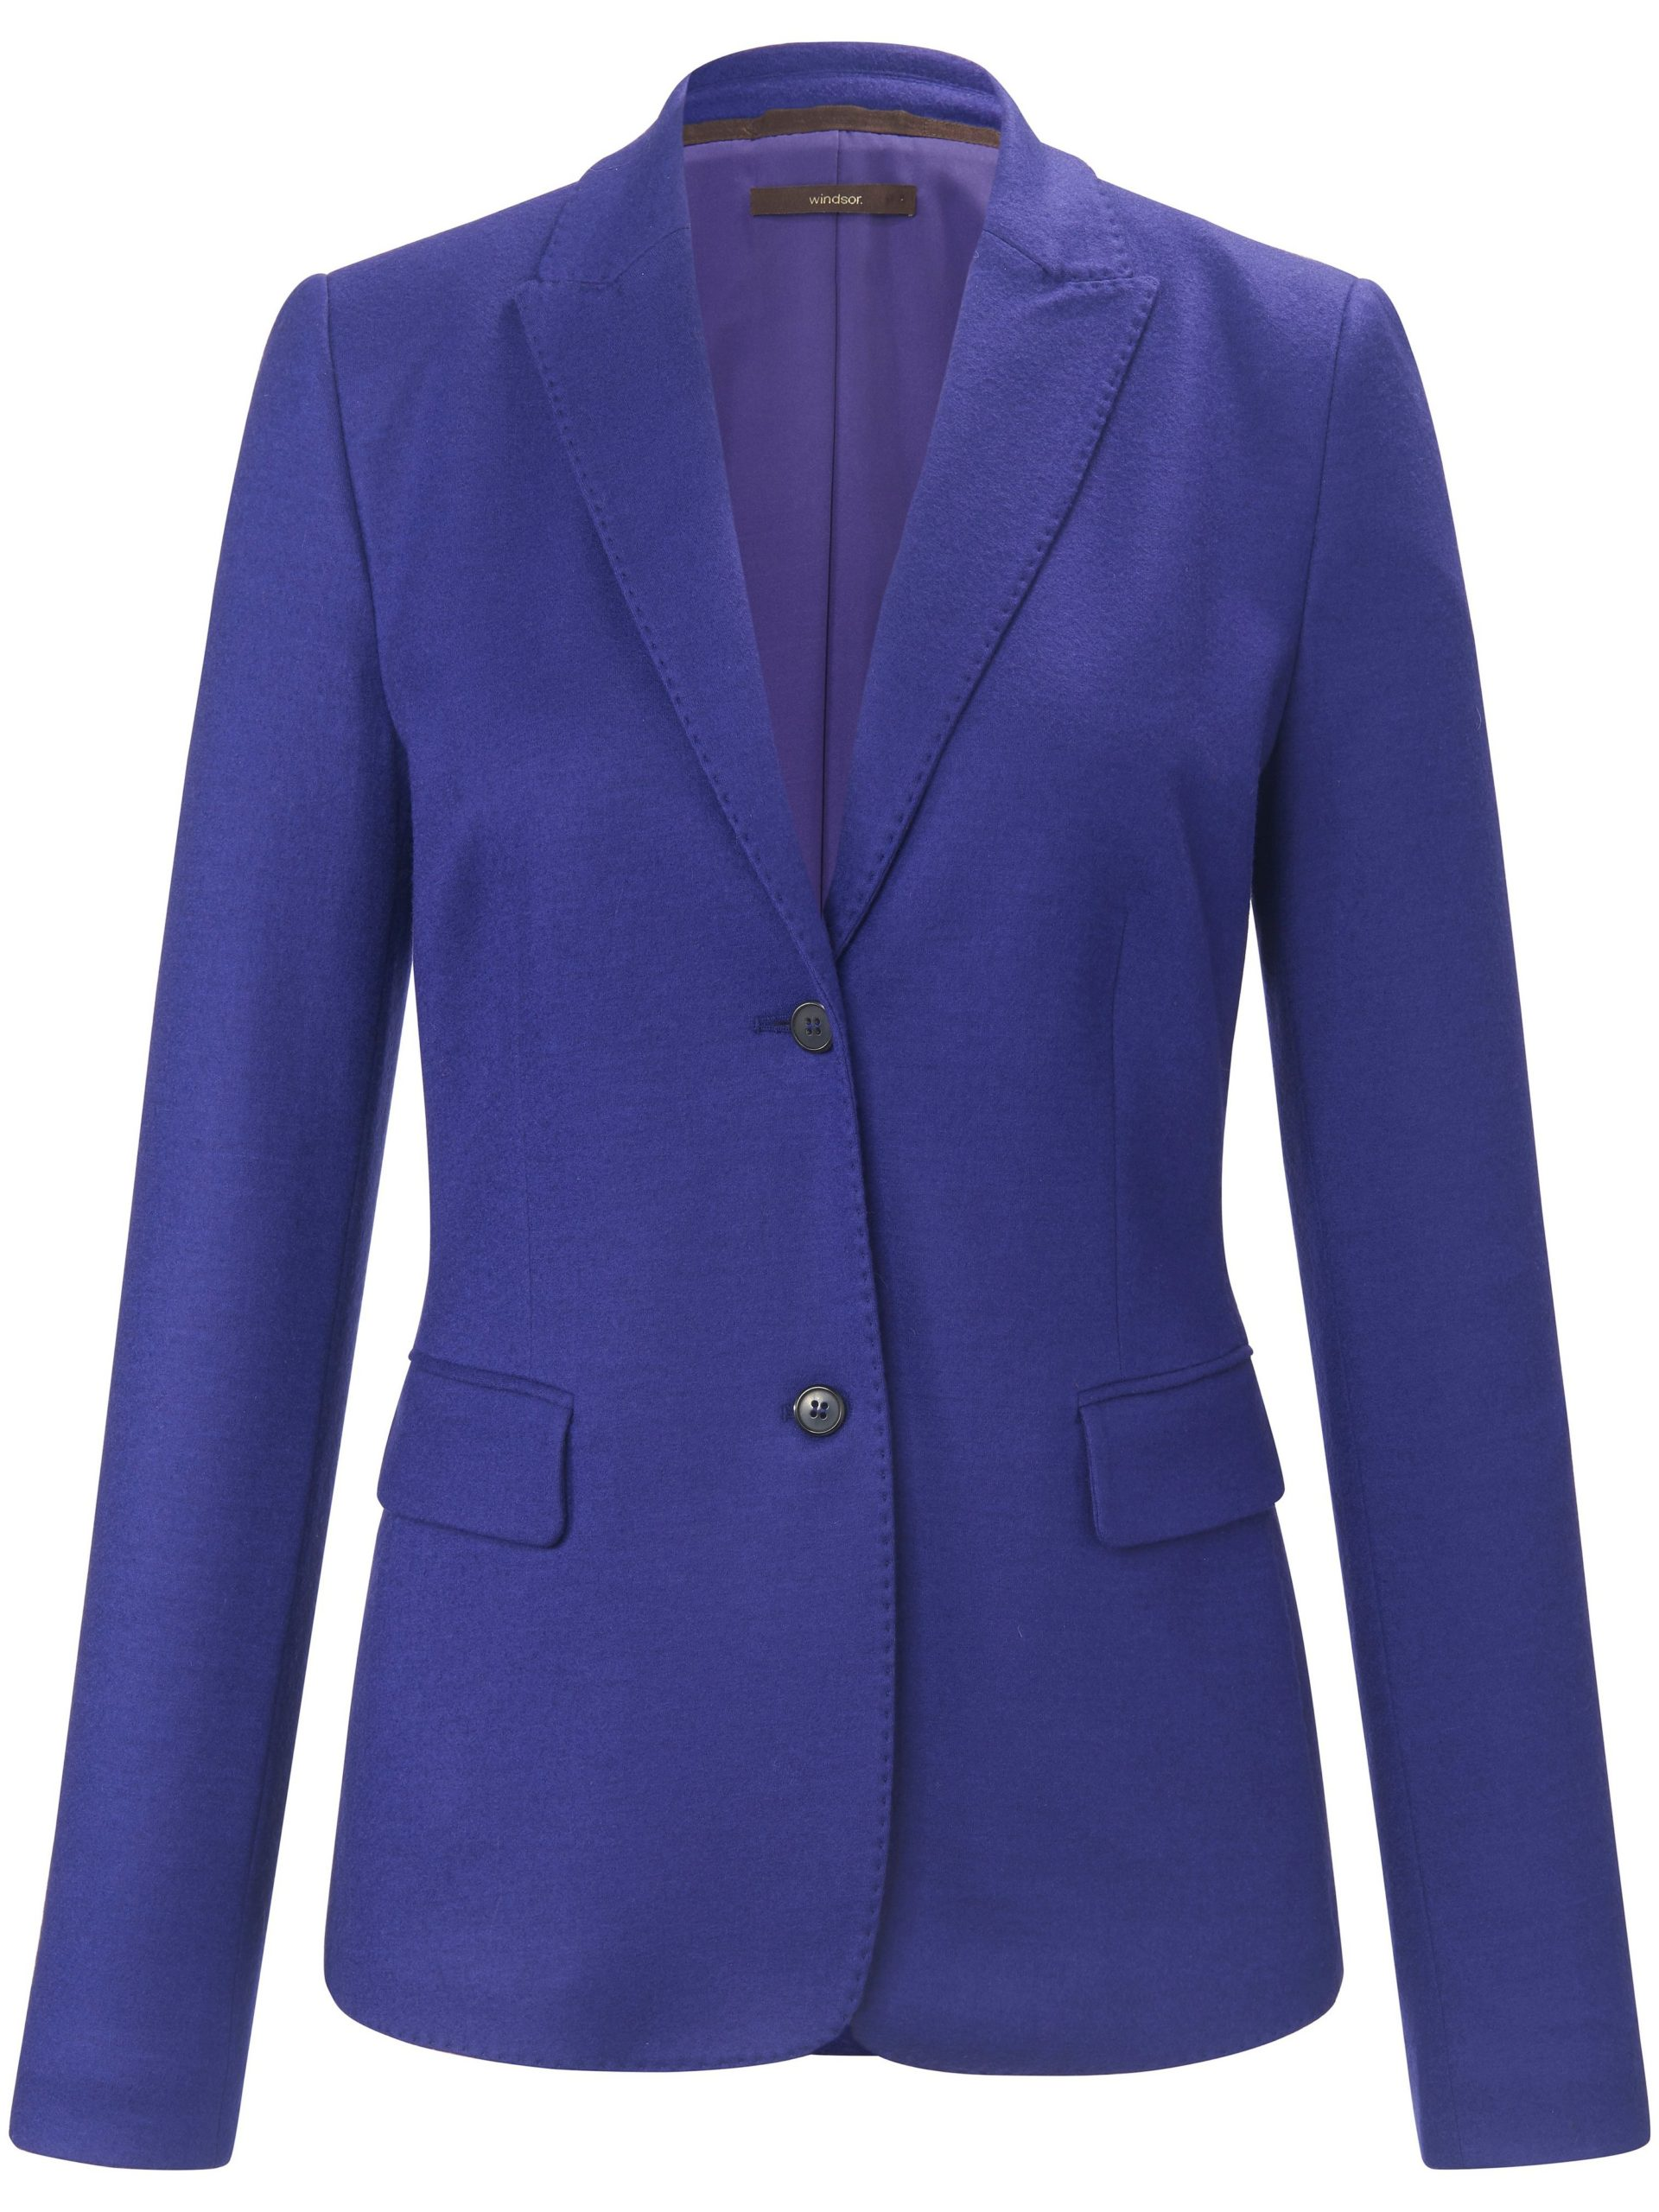 Jerseyblazer 100% wol blind rugsplit Van Windsor paars Kopen